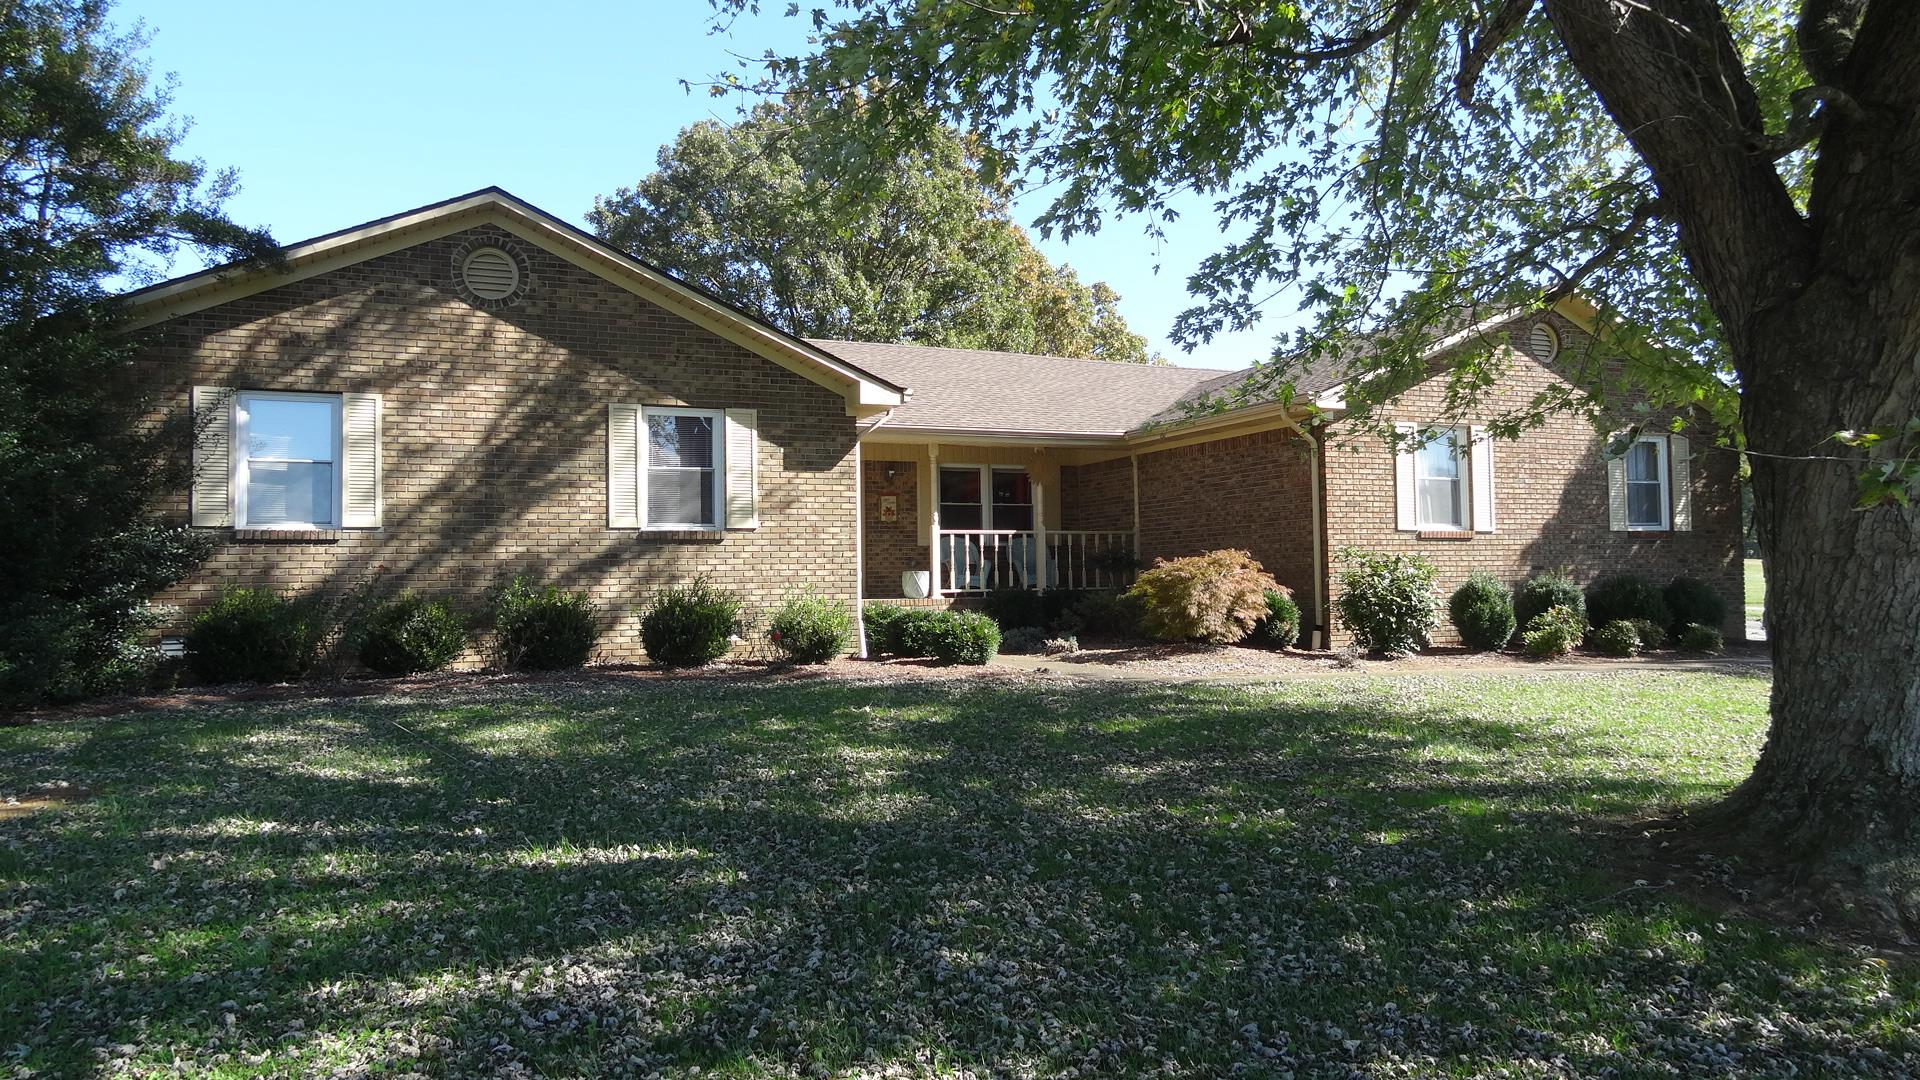 7645 State Hwy 973, Dunmor, KY 42339 - Dunmor, KY real estate listing